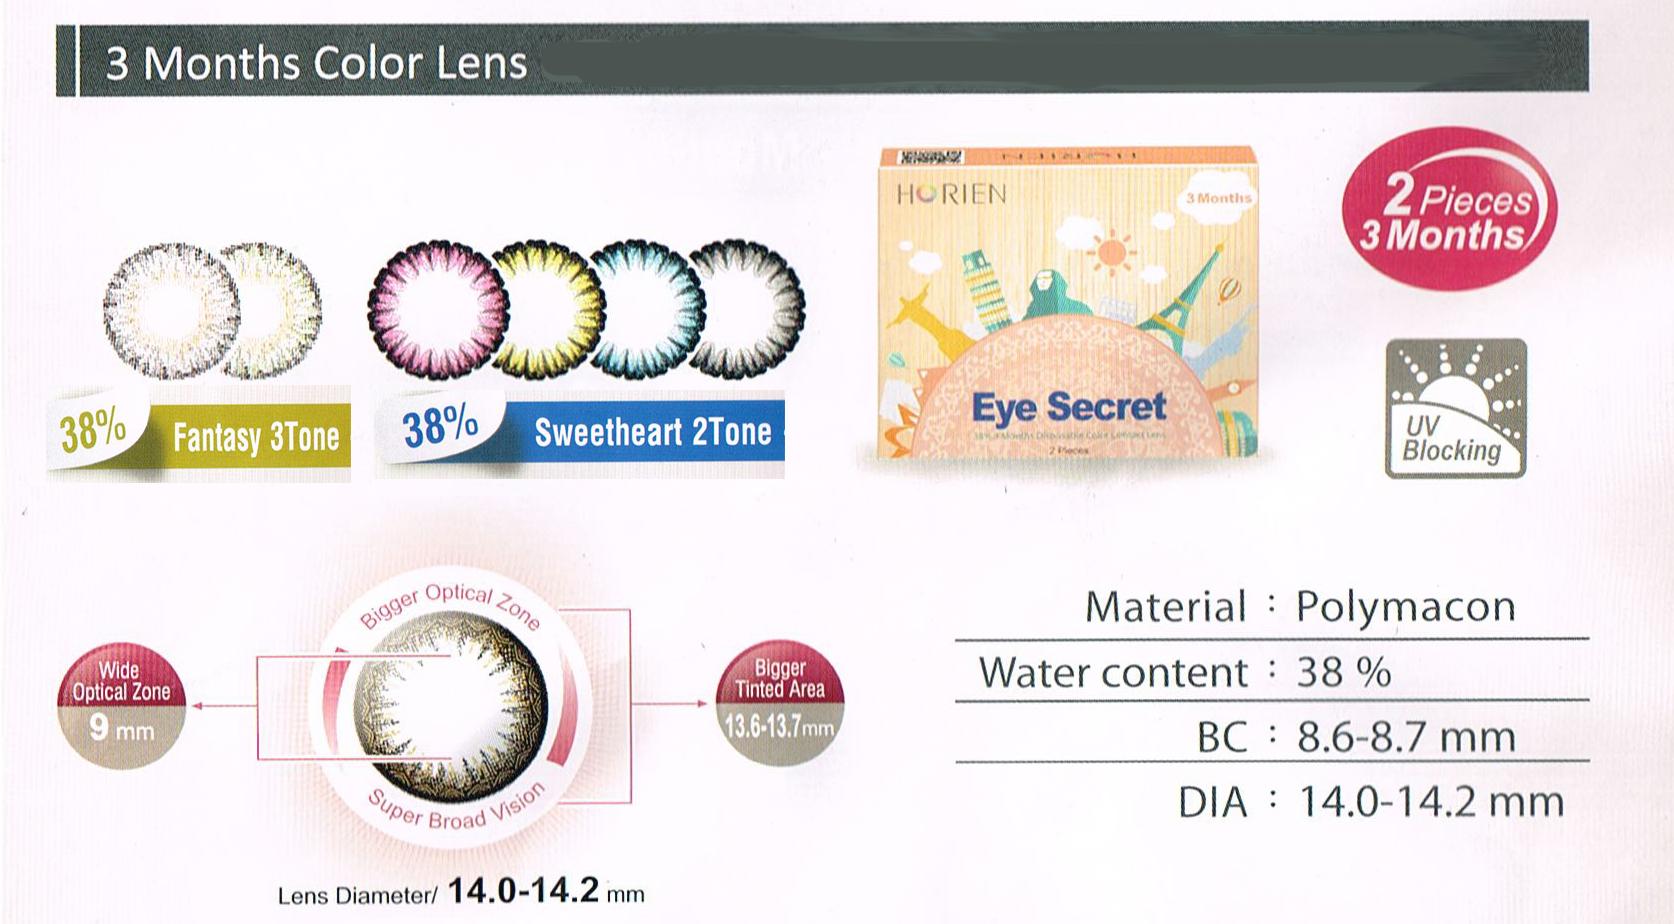 Horien eye secret 3 months contact lens my contactlens color chart nvjuhfo Choice Image